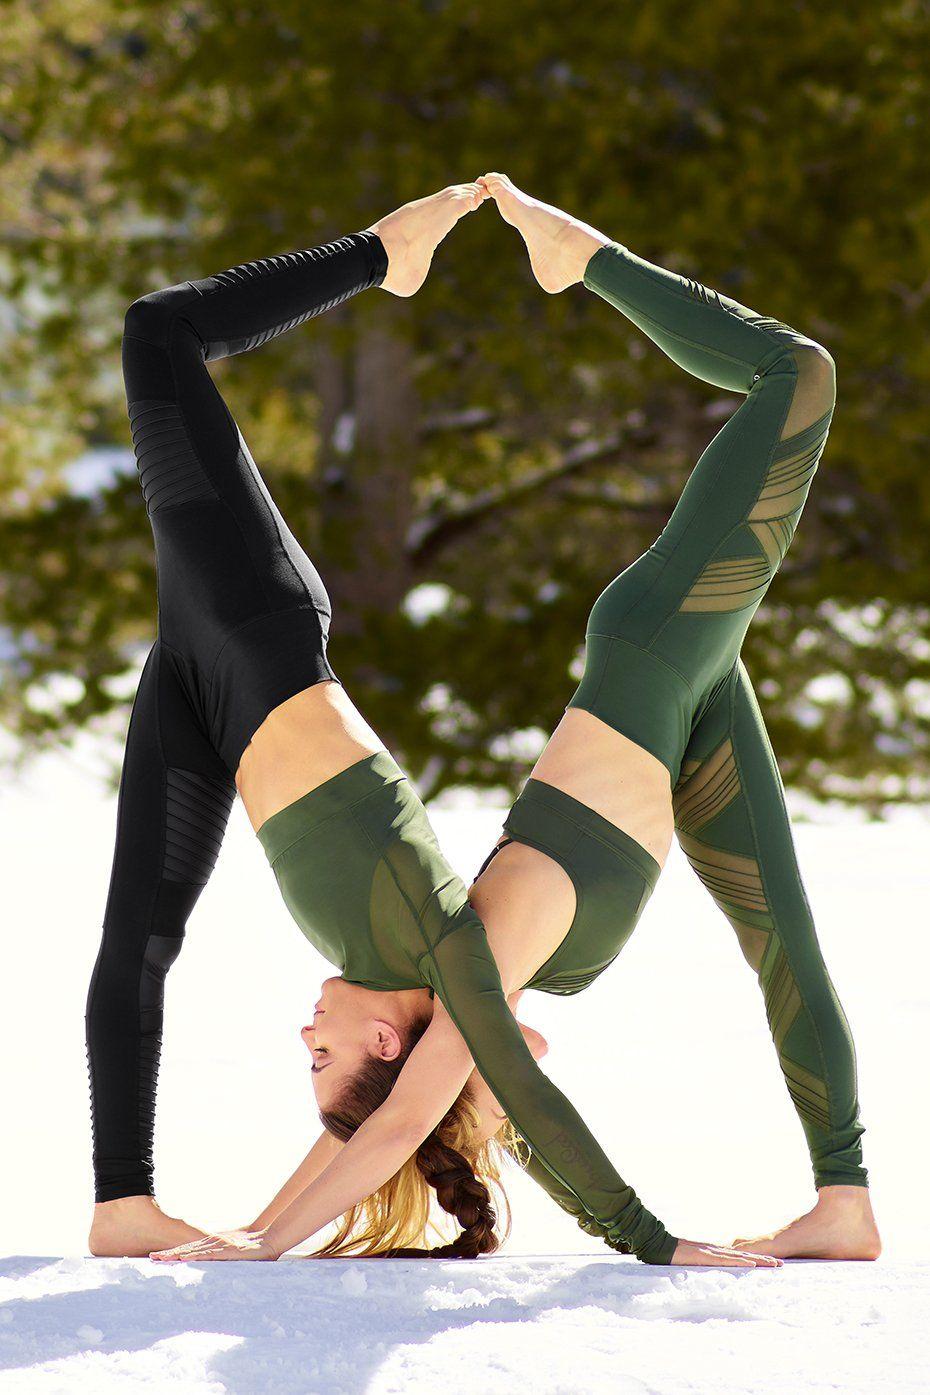 Alo Yoga Ultimate High Waist Legging In Hunter Usd122 Partner Yoga Poses Acro Yoga Poses Partner Yoga